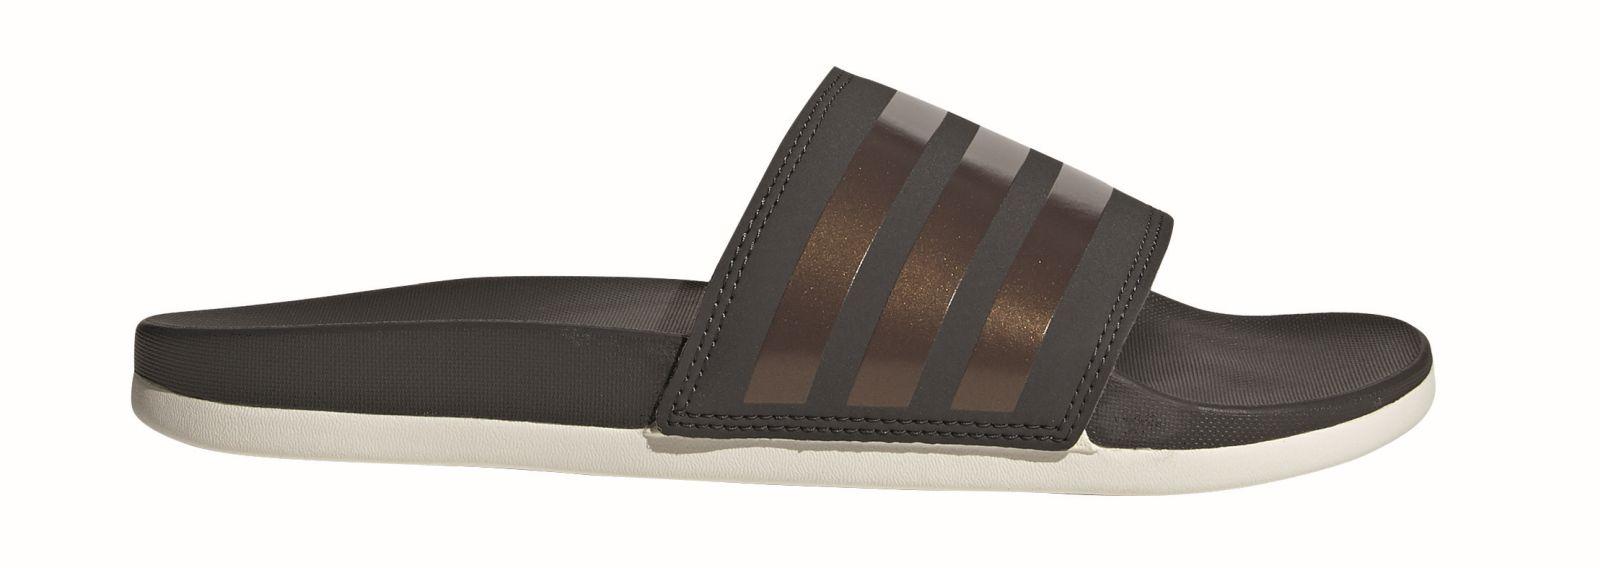 sports shoes 1560c 0add7 adidas Performance Herren Badelatschen Adilette Comfort grau